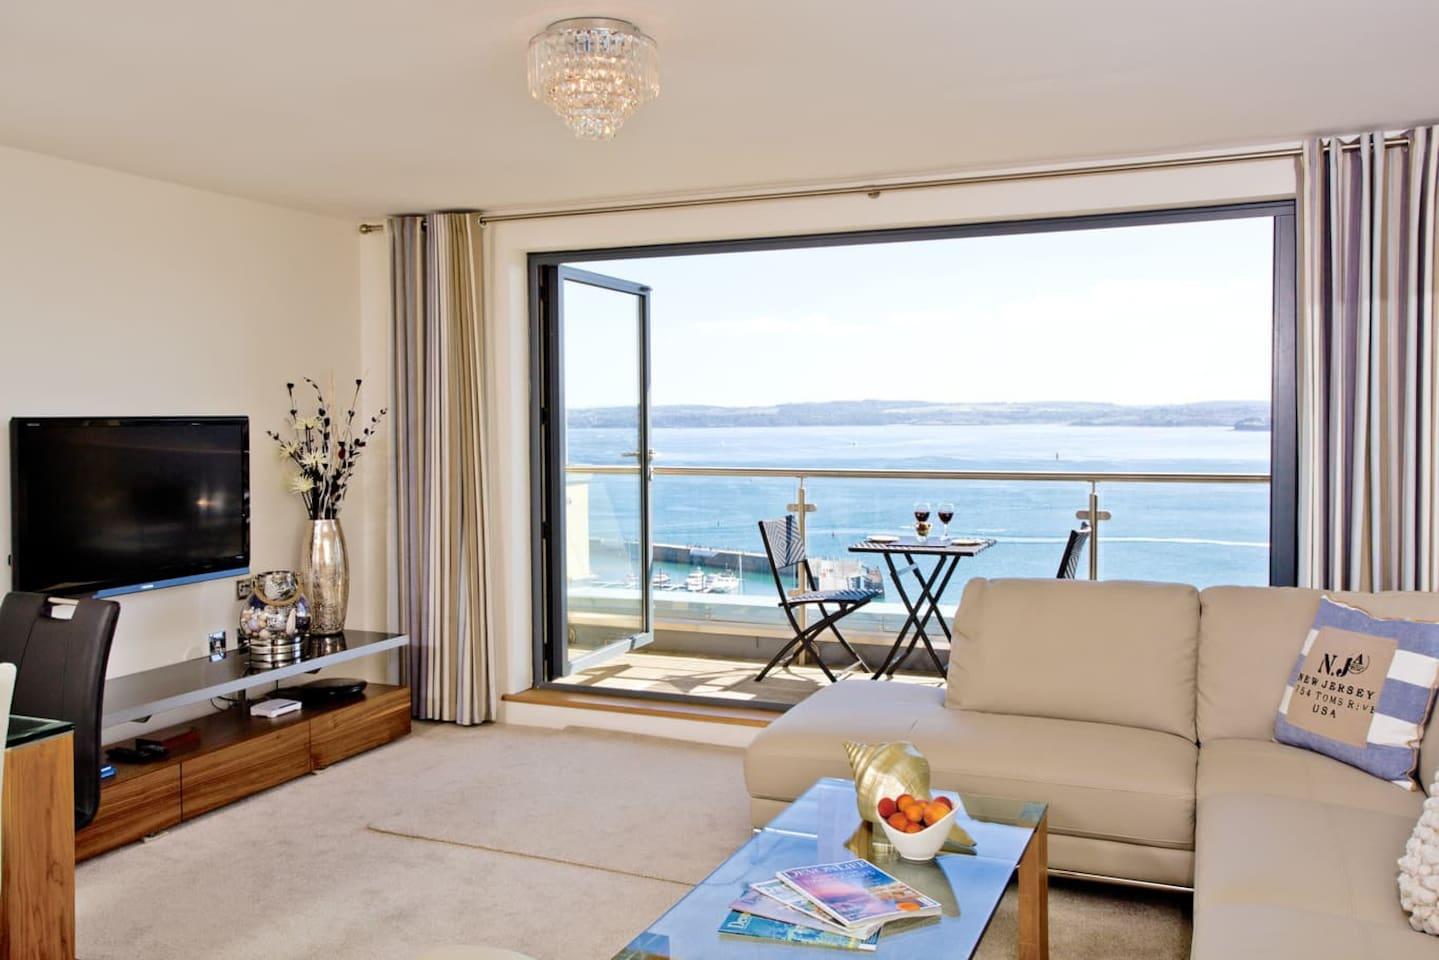 5 Star Platinum Holiday Apartment in Torquay